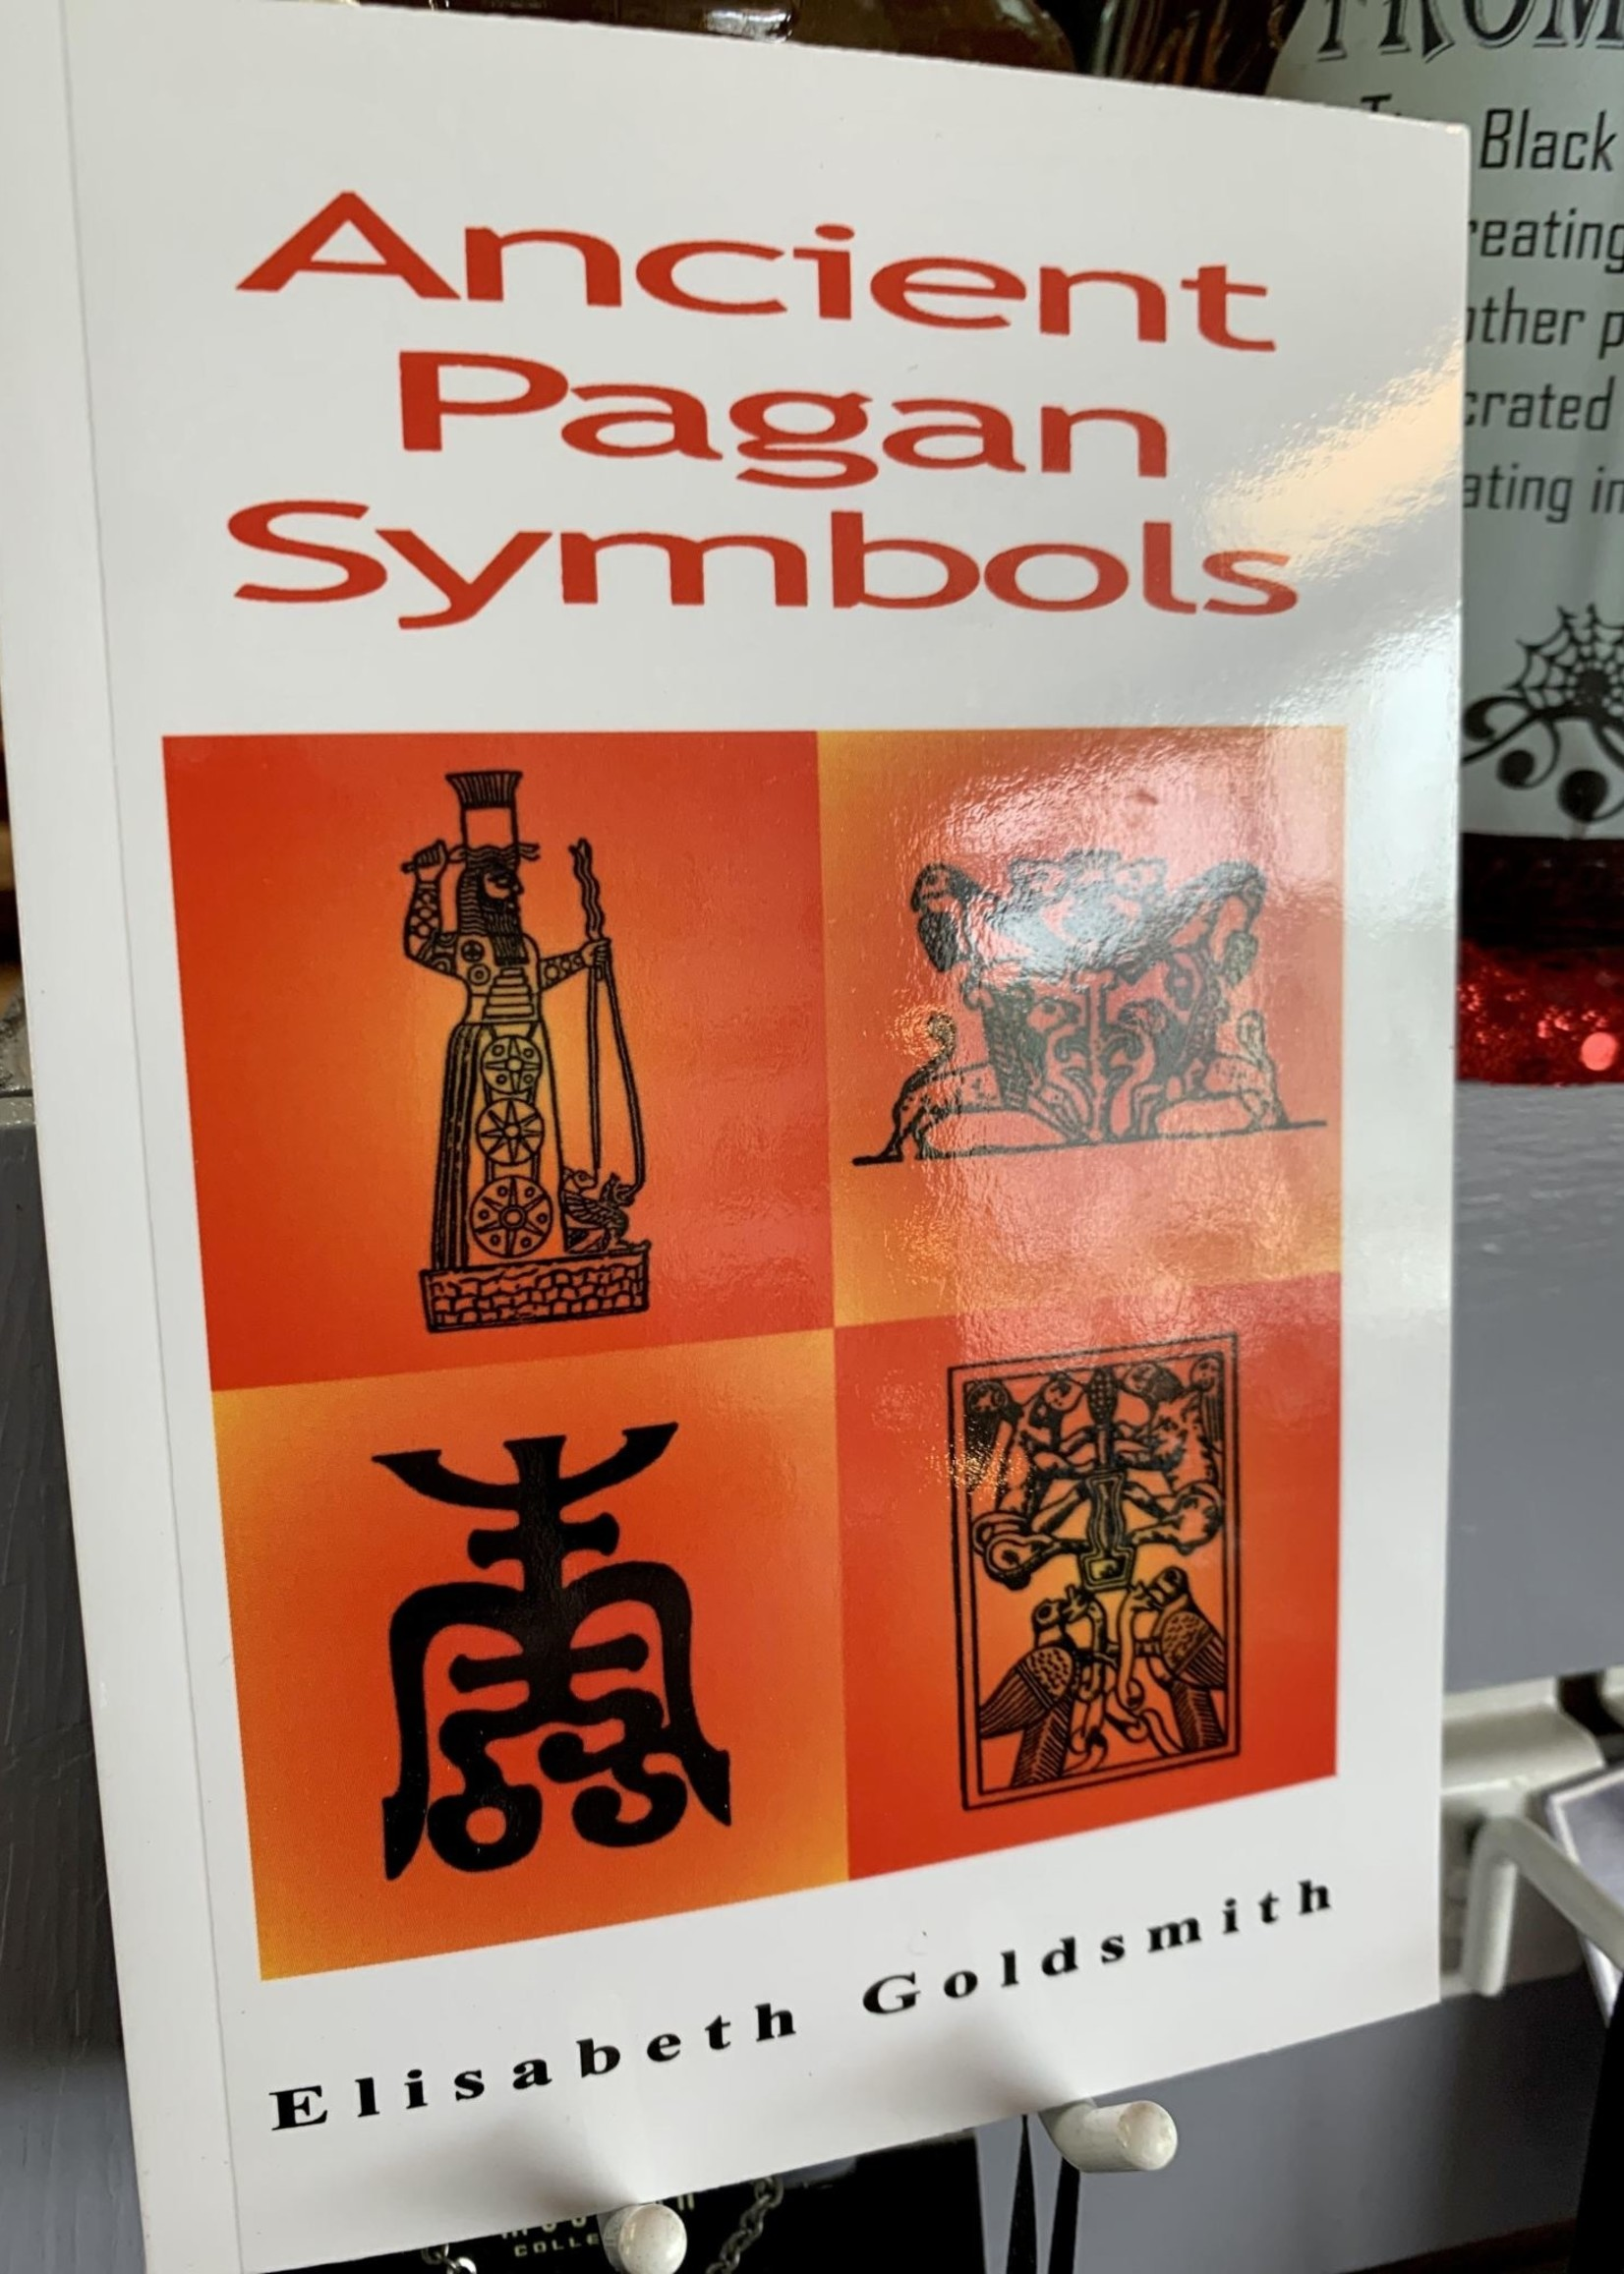 Ancient Pagan Symbols - Elisabeth Goldsmith